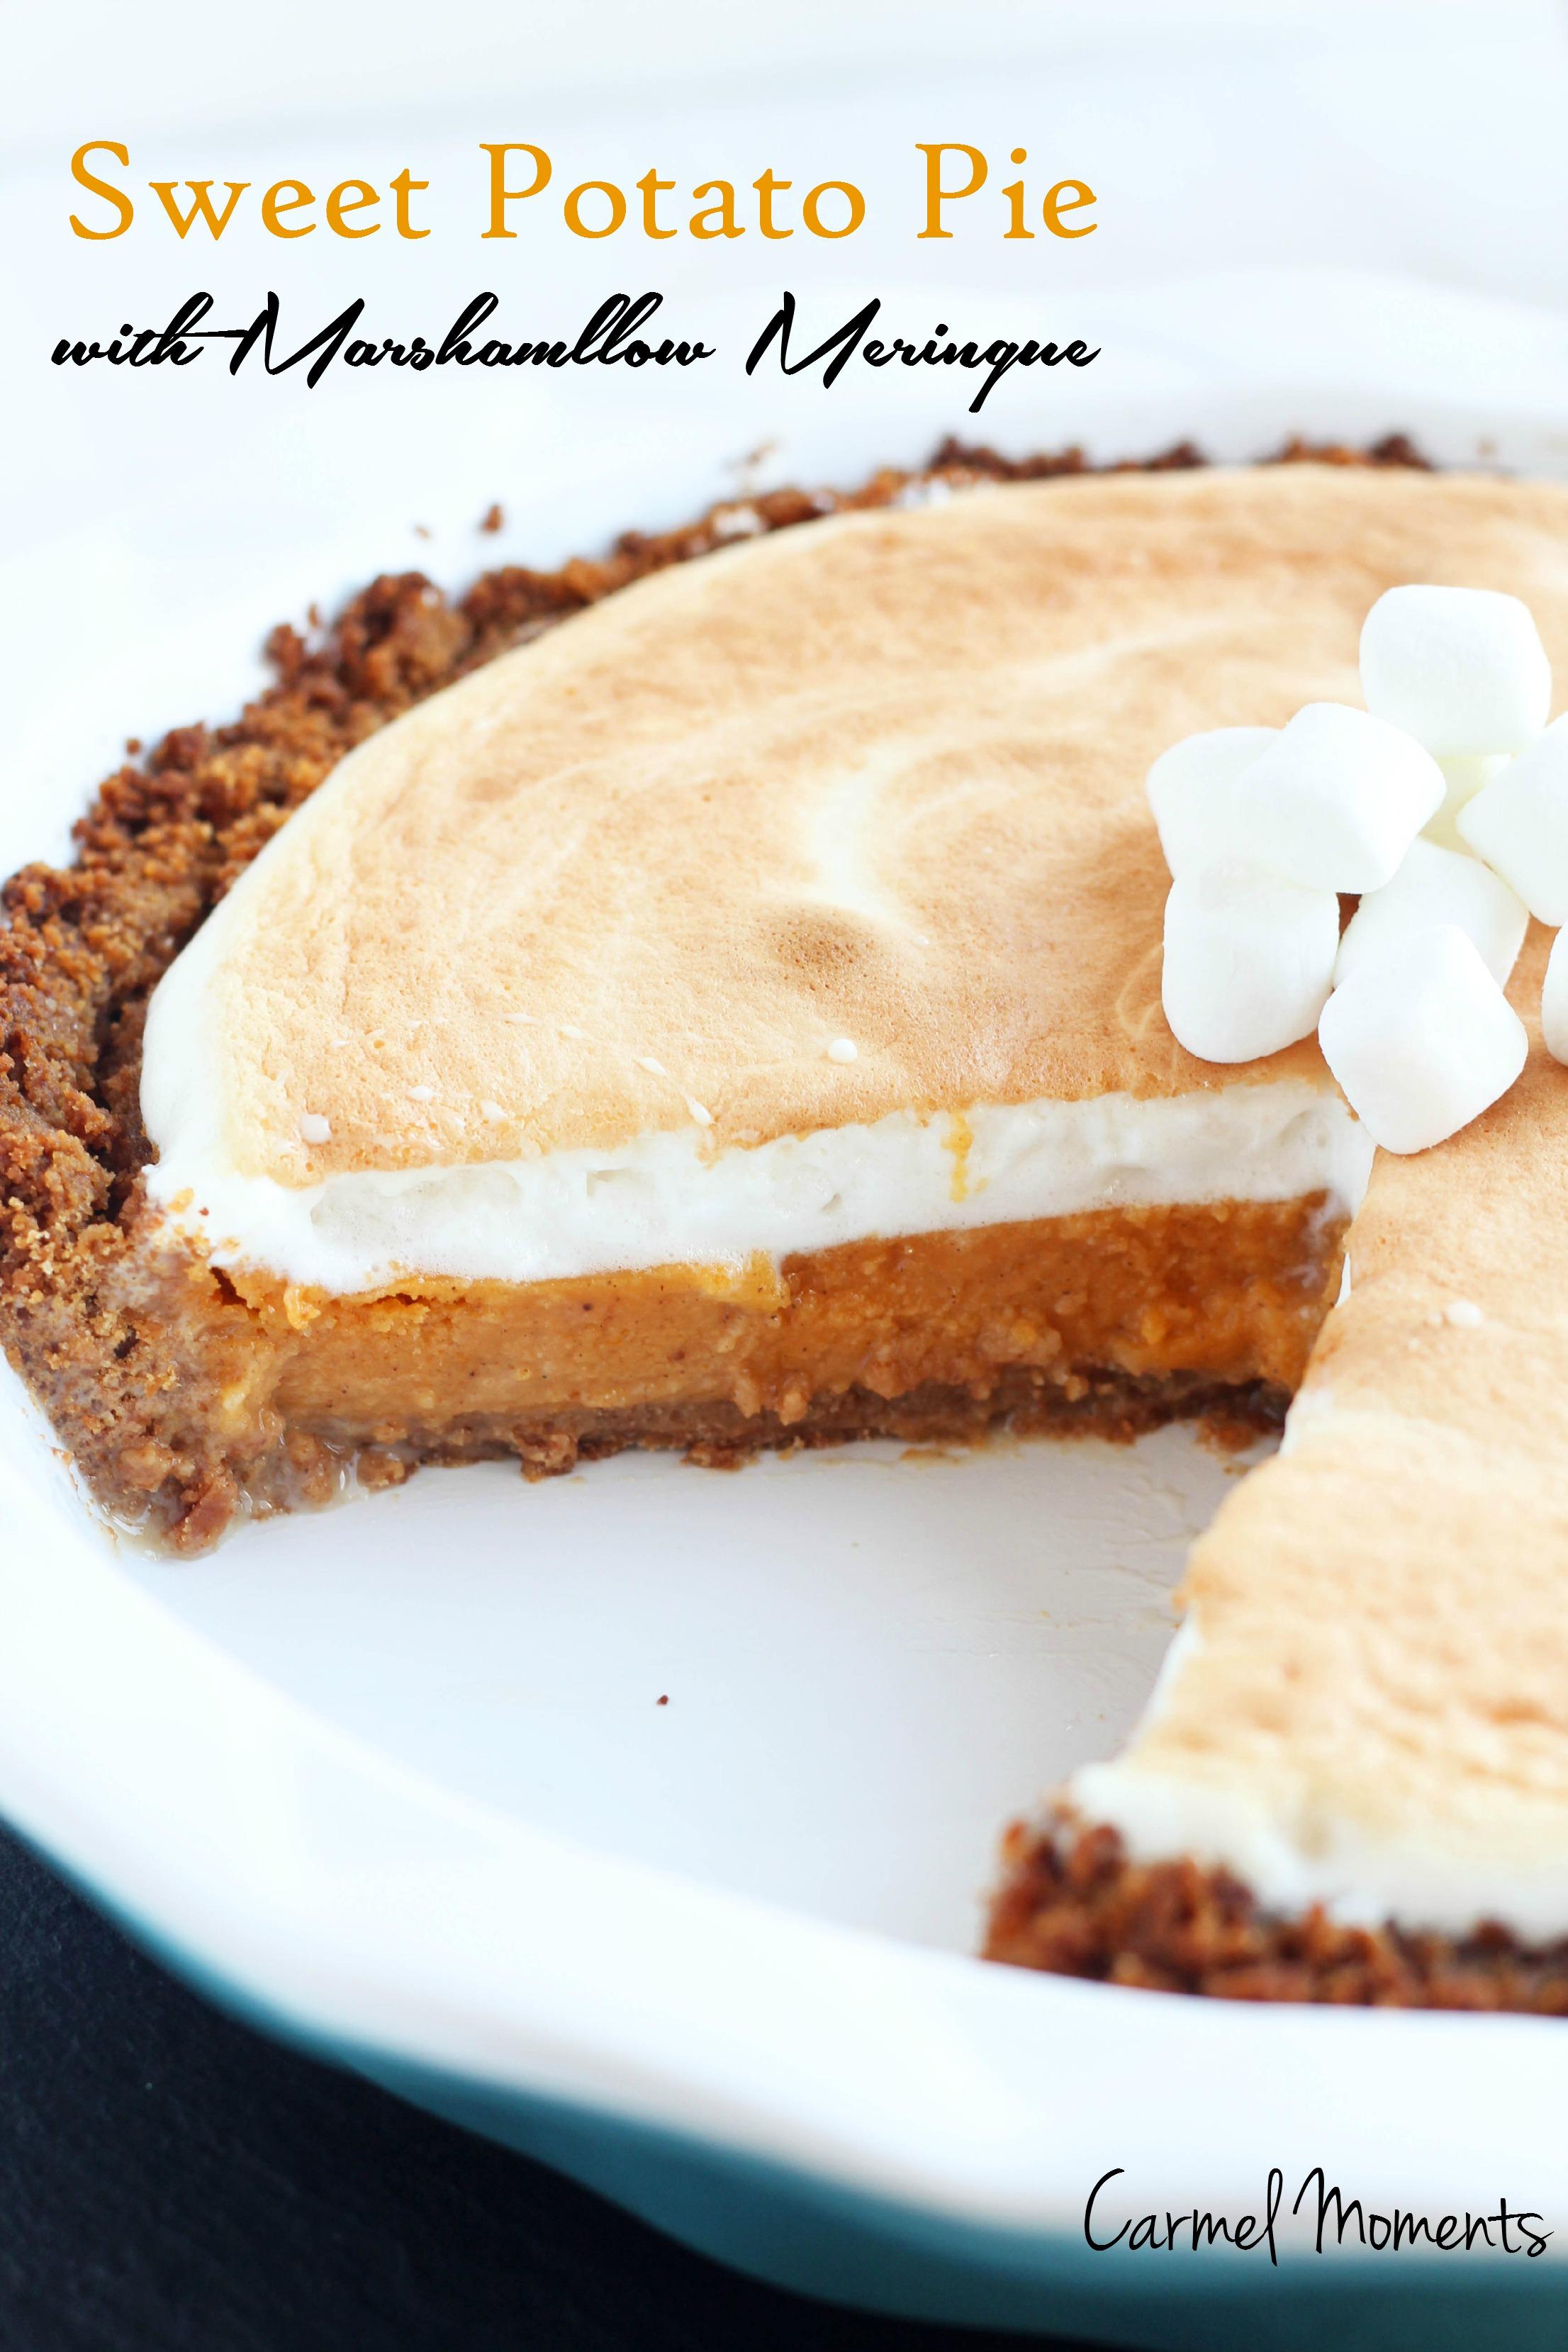 Sweet Potato Pie With Marshmallow Meringue